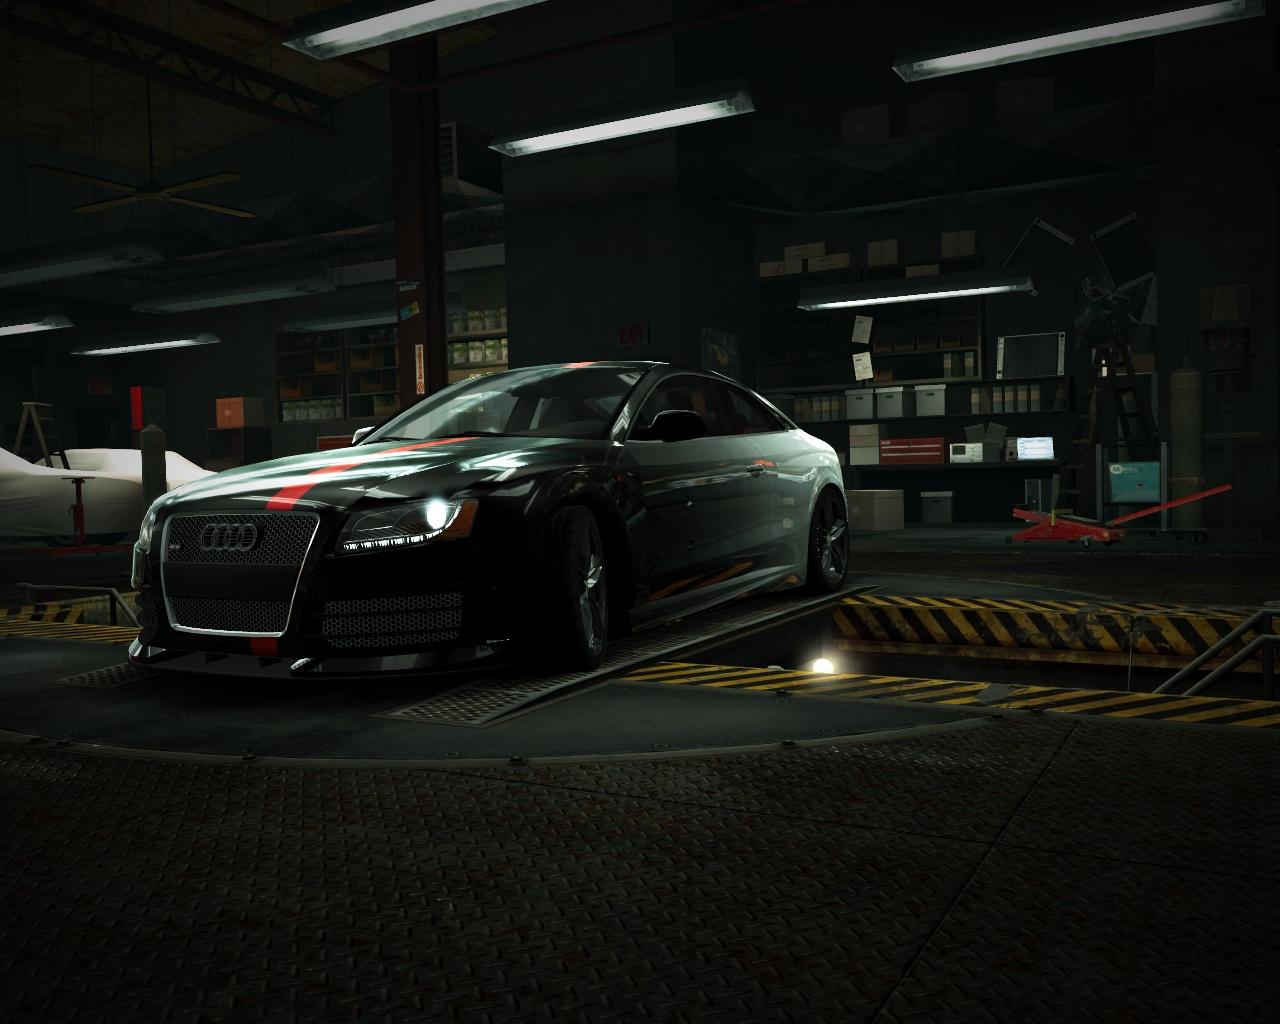 Audi S5 by RyuMakkuro